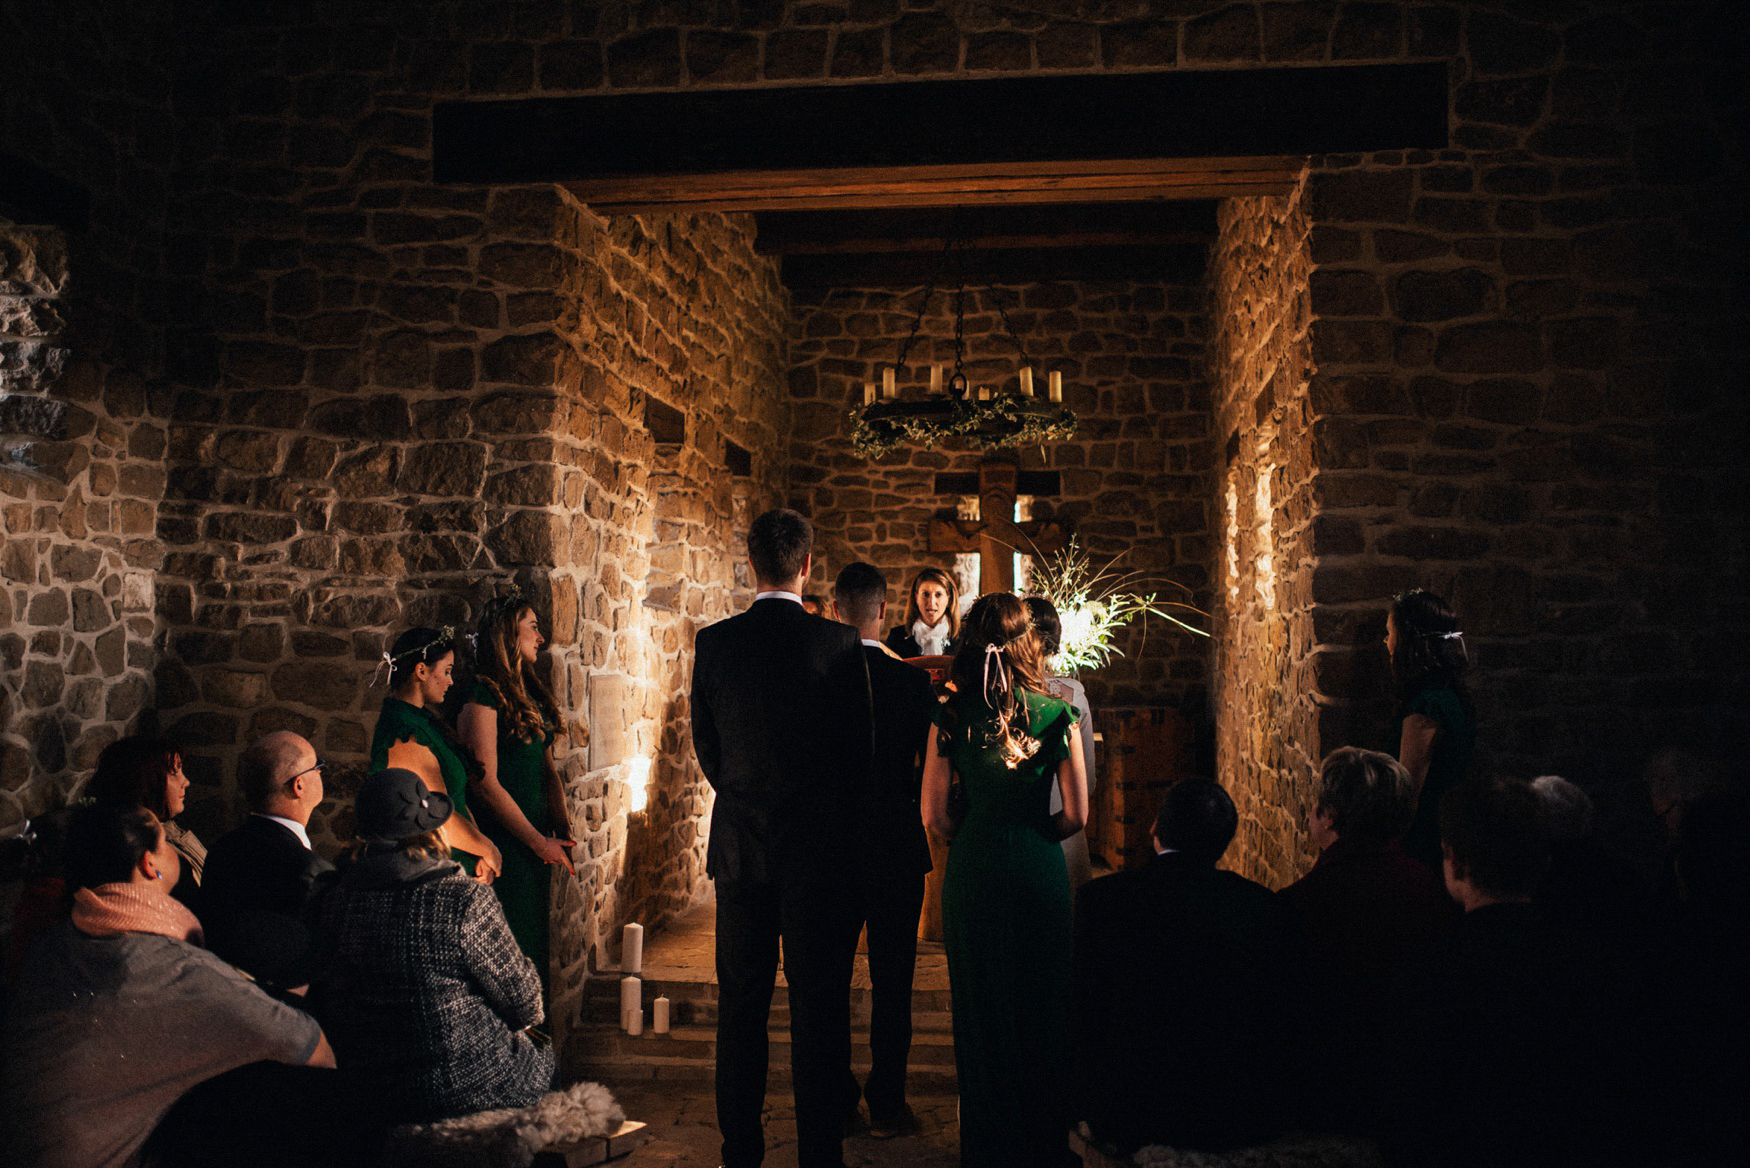 2 prague wedding photographer - boho svatba zikmundov014.jpg